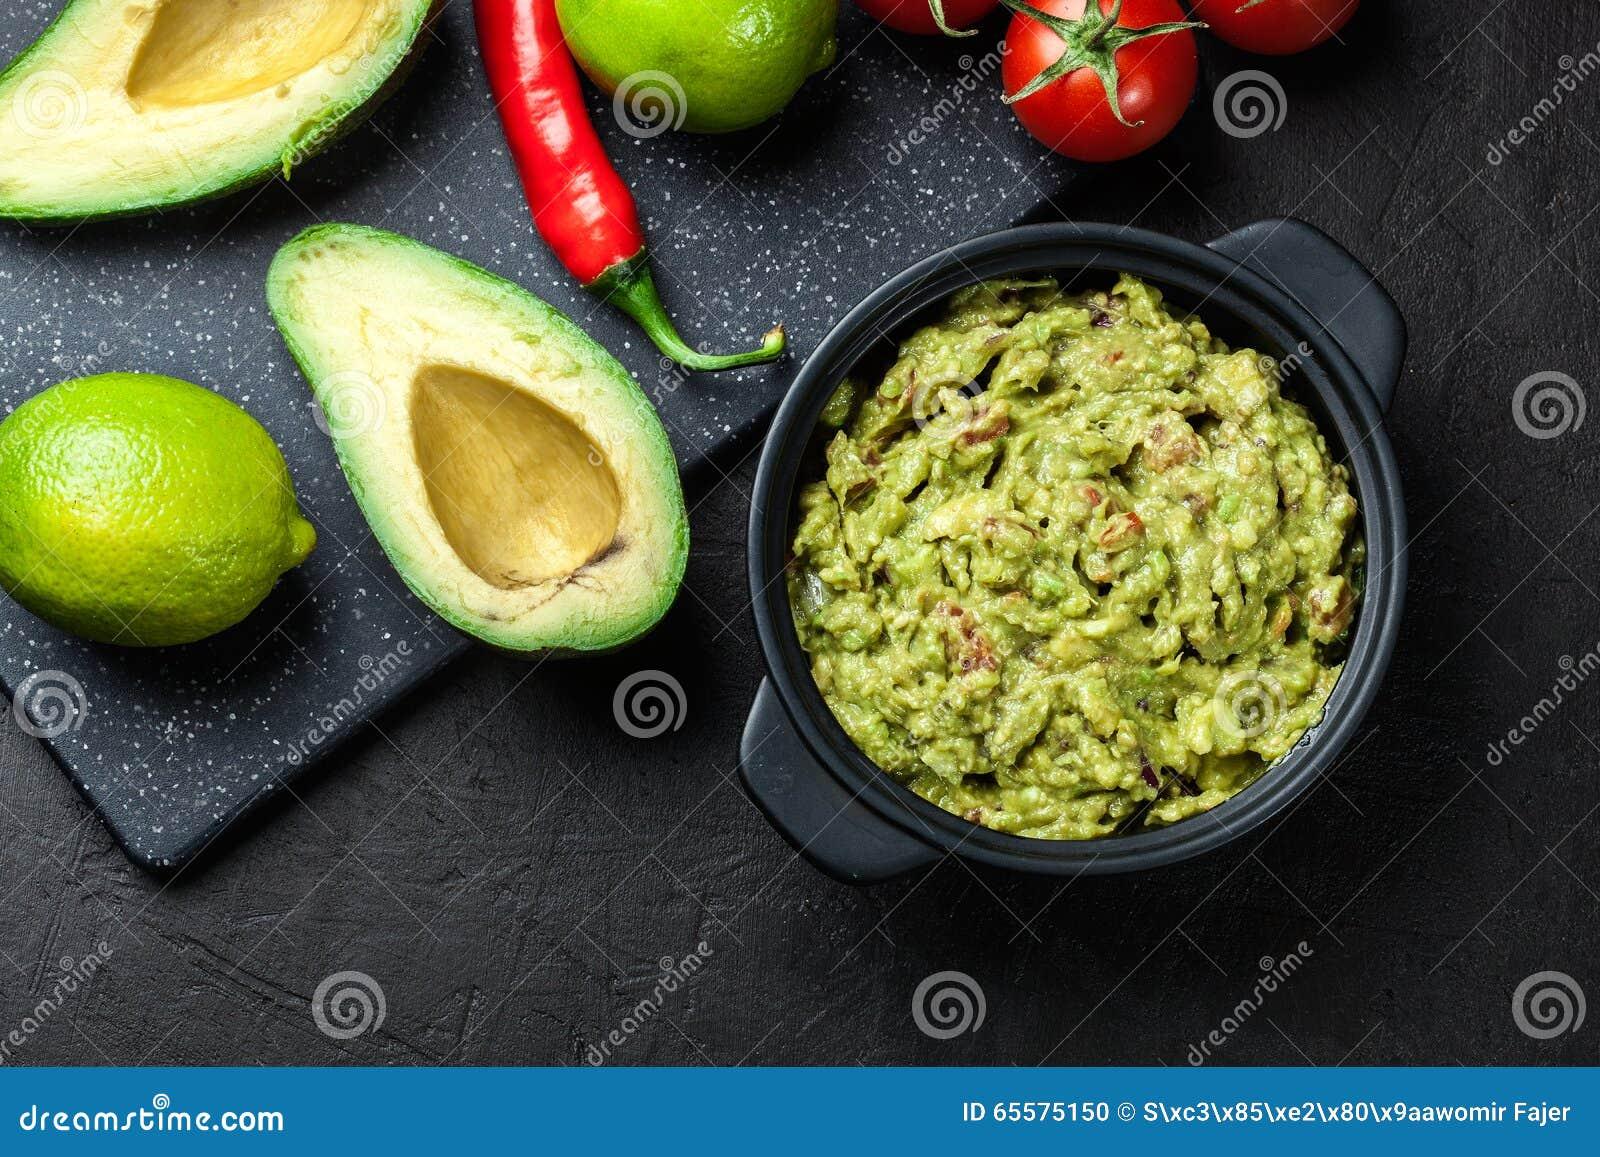 Bacia de guacamole com ingredientes frescos